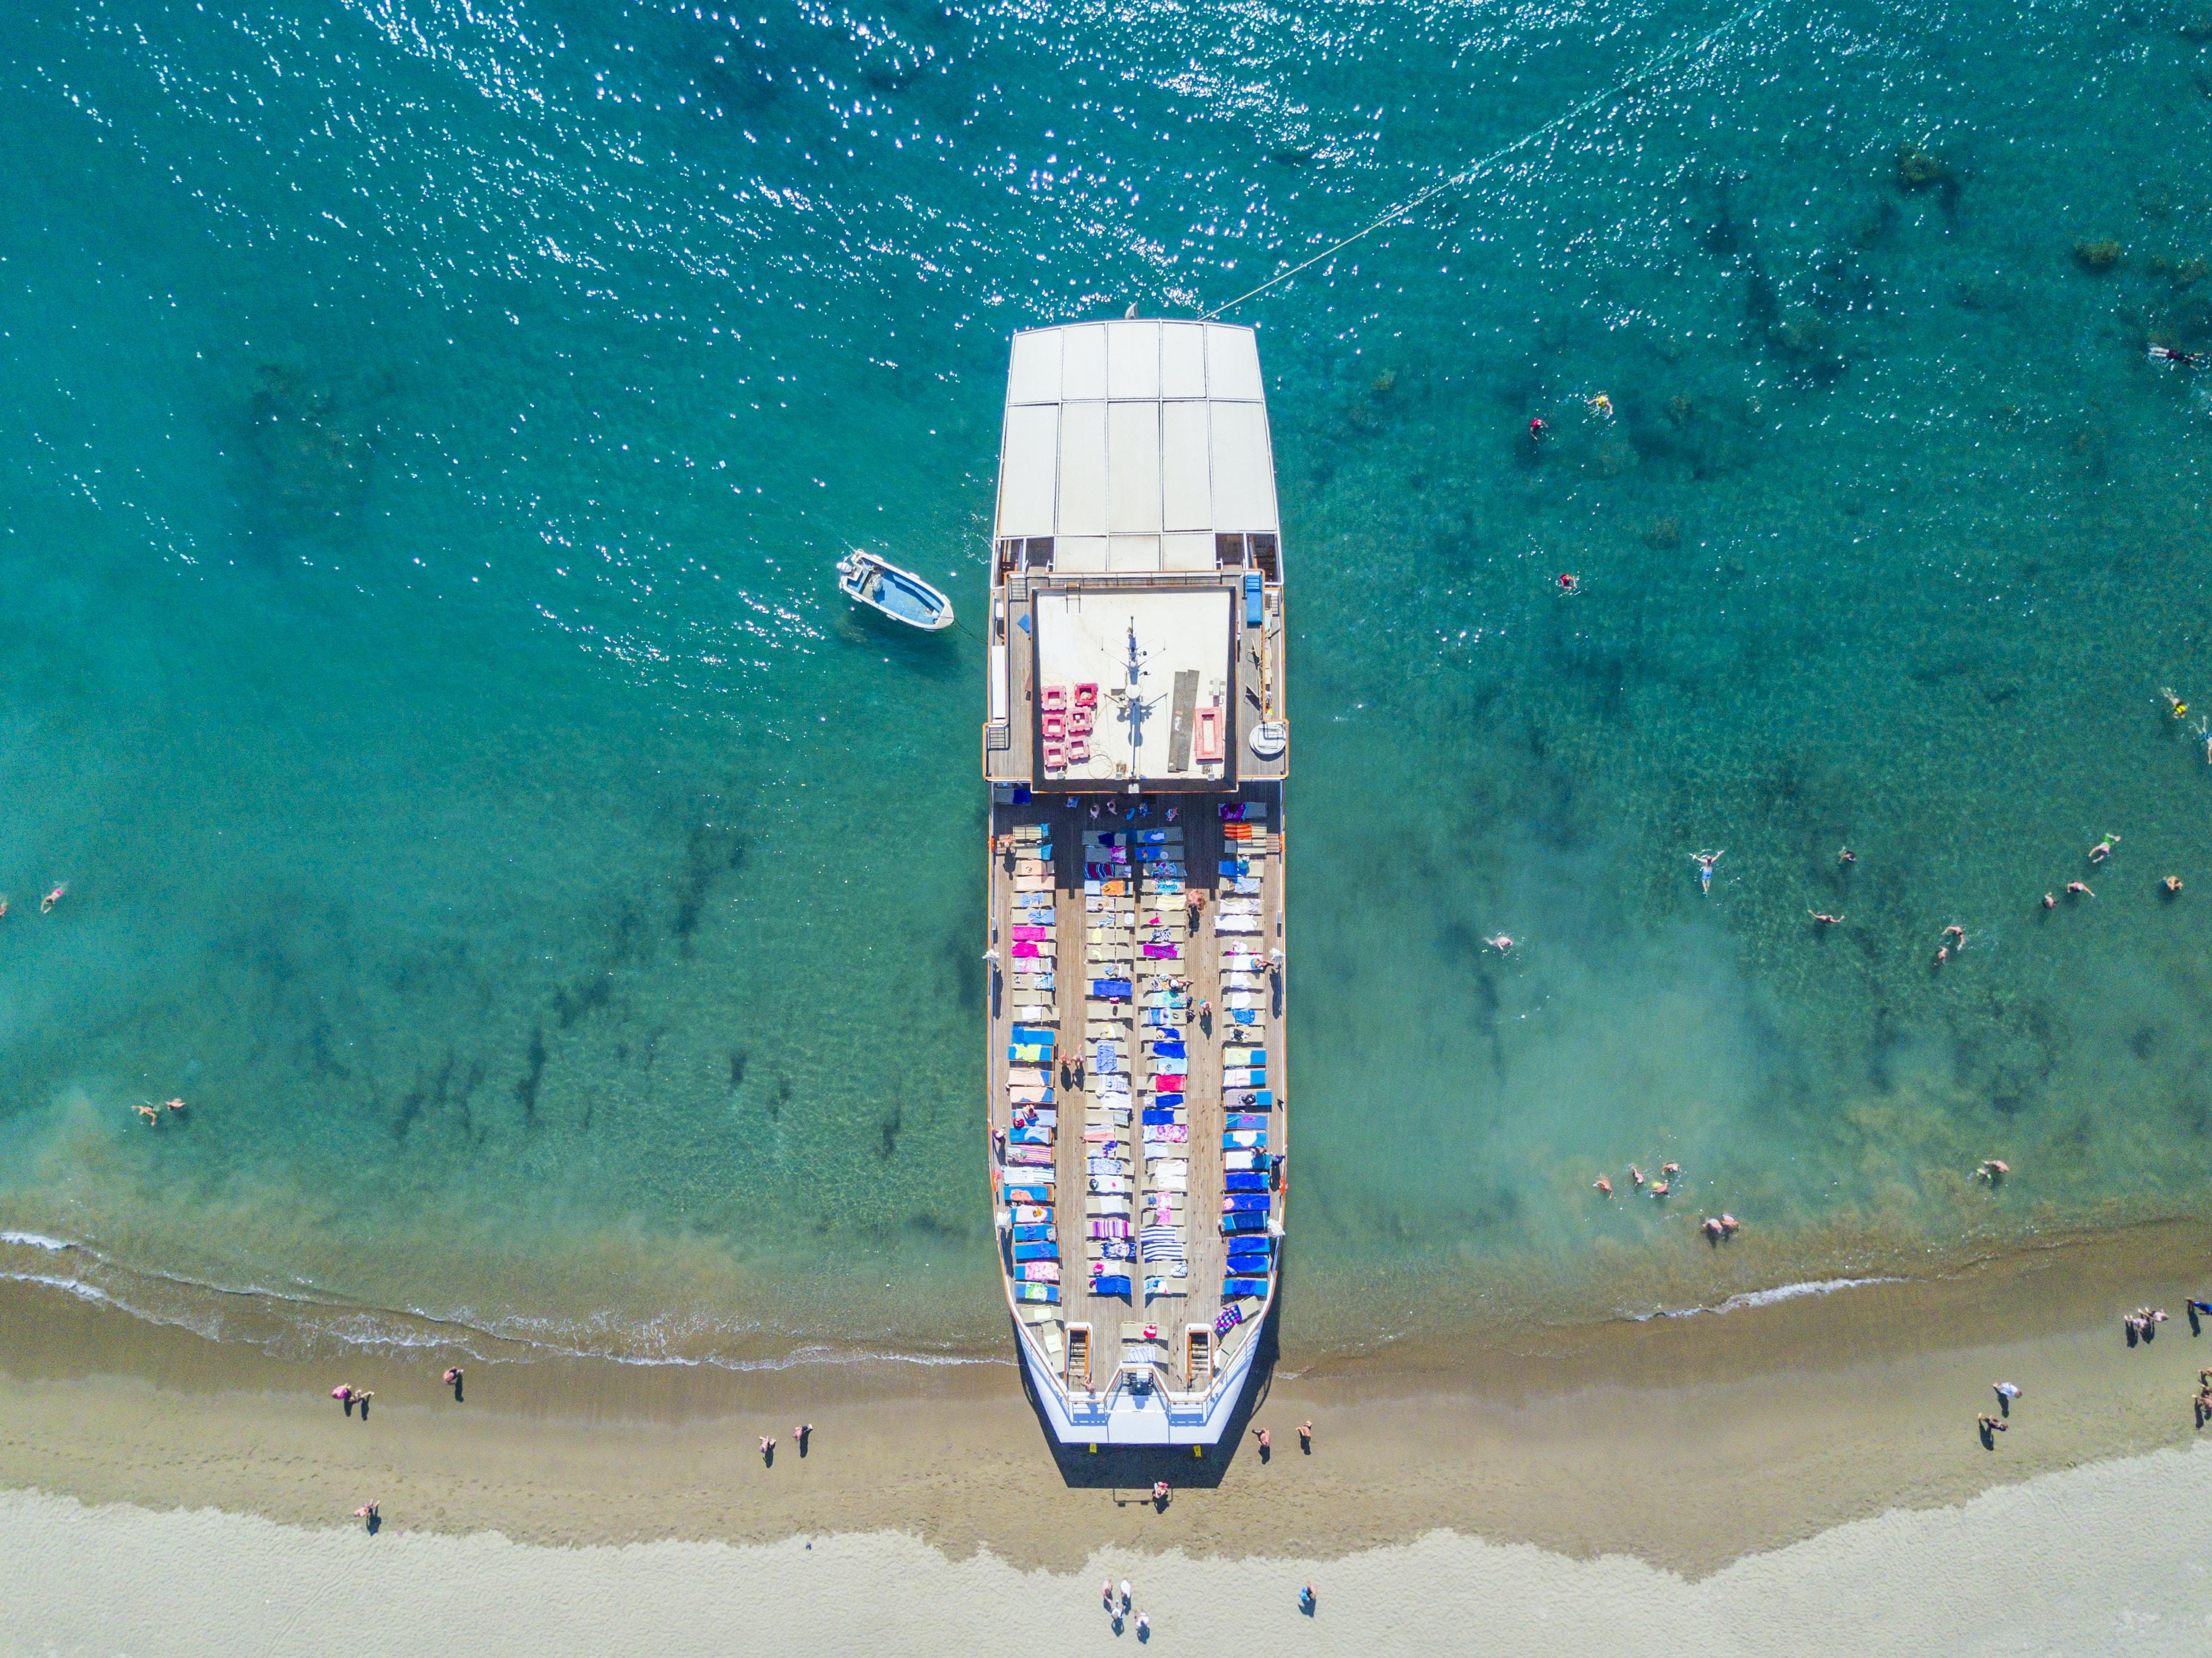 bird's eye view of ship